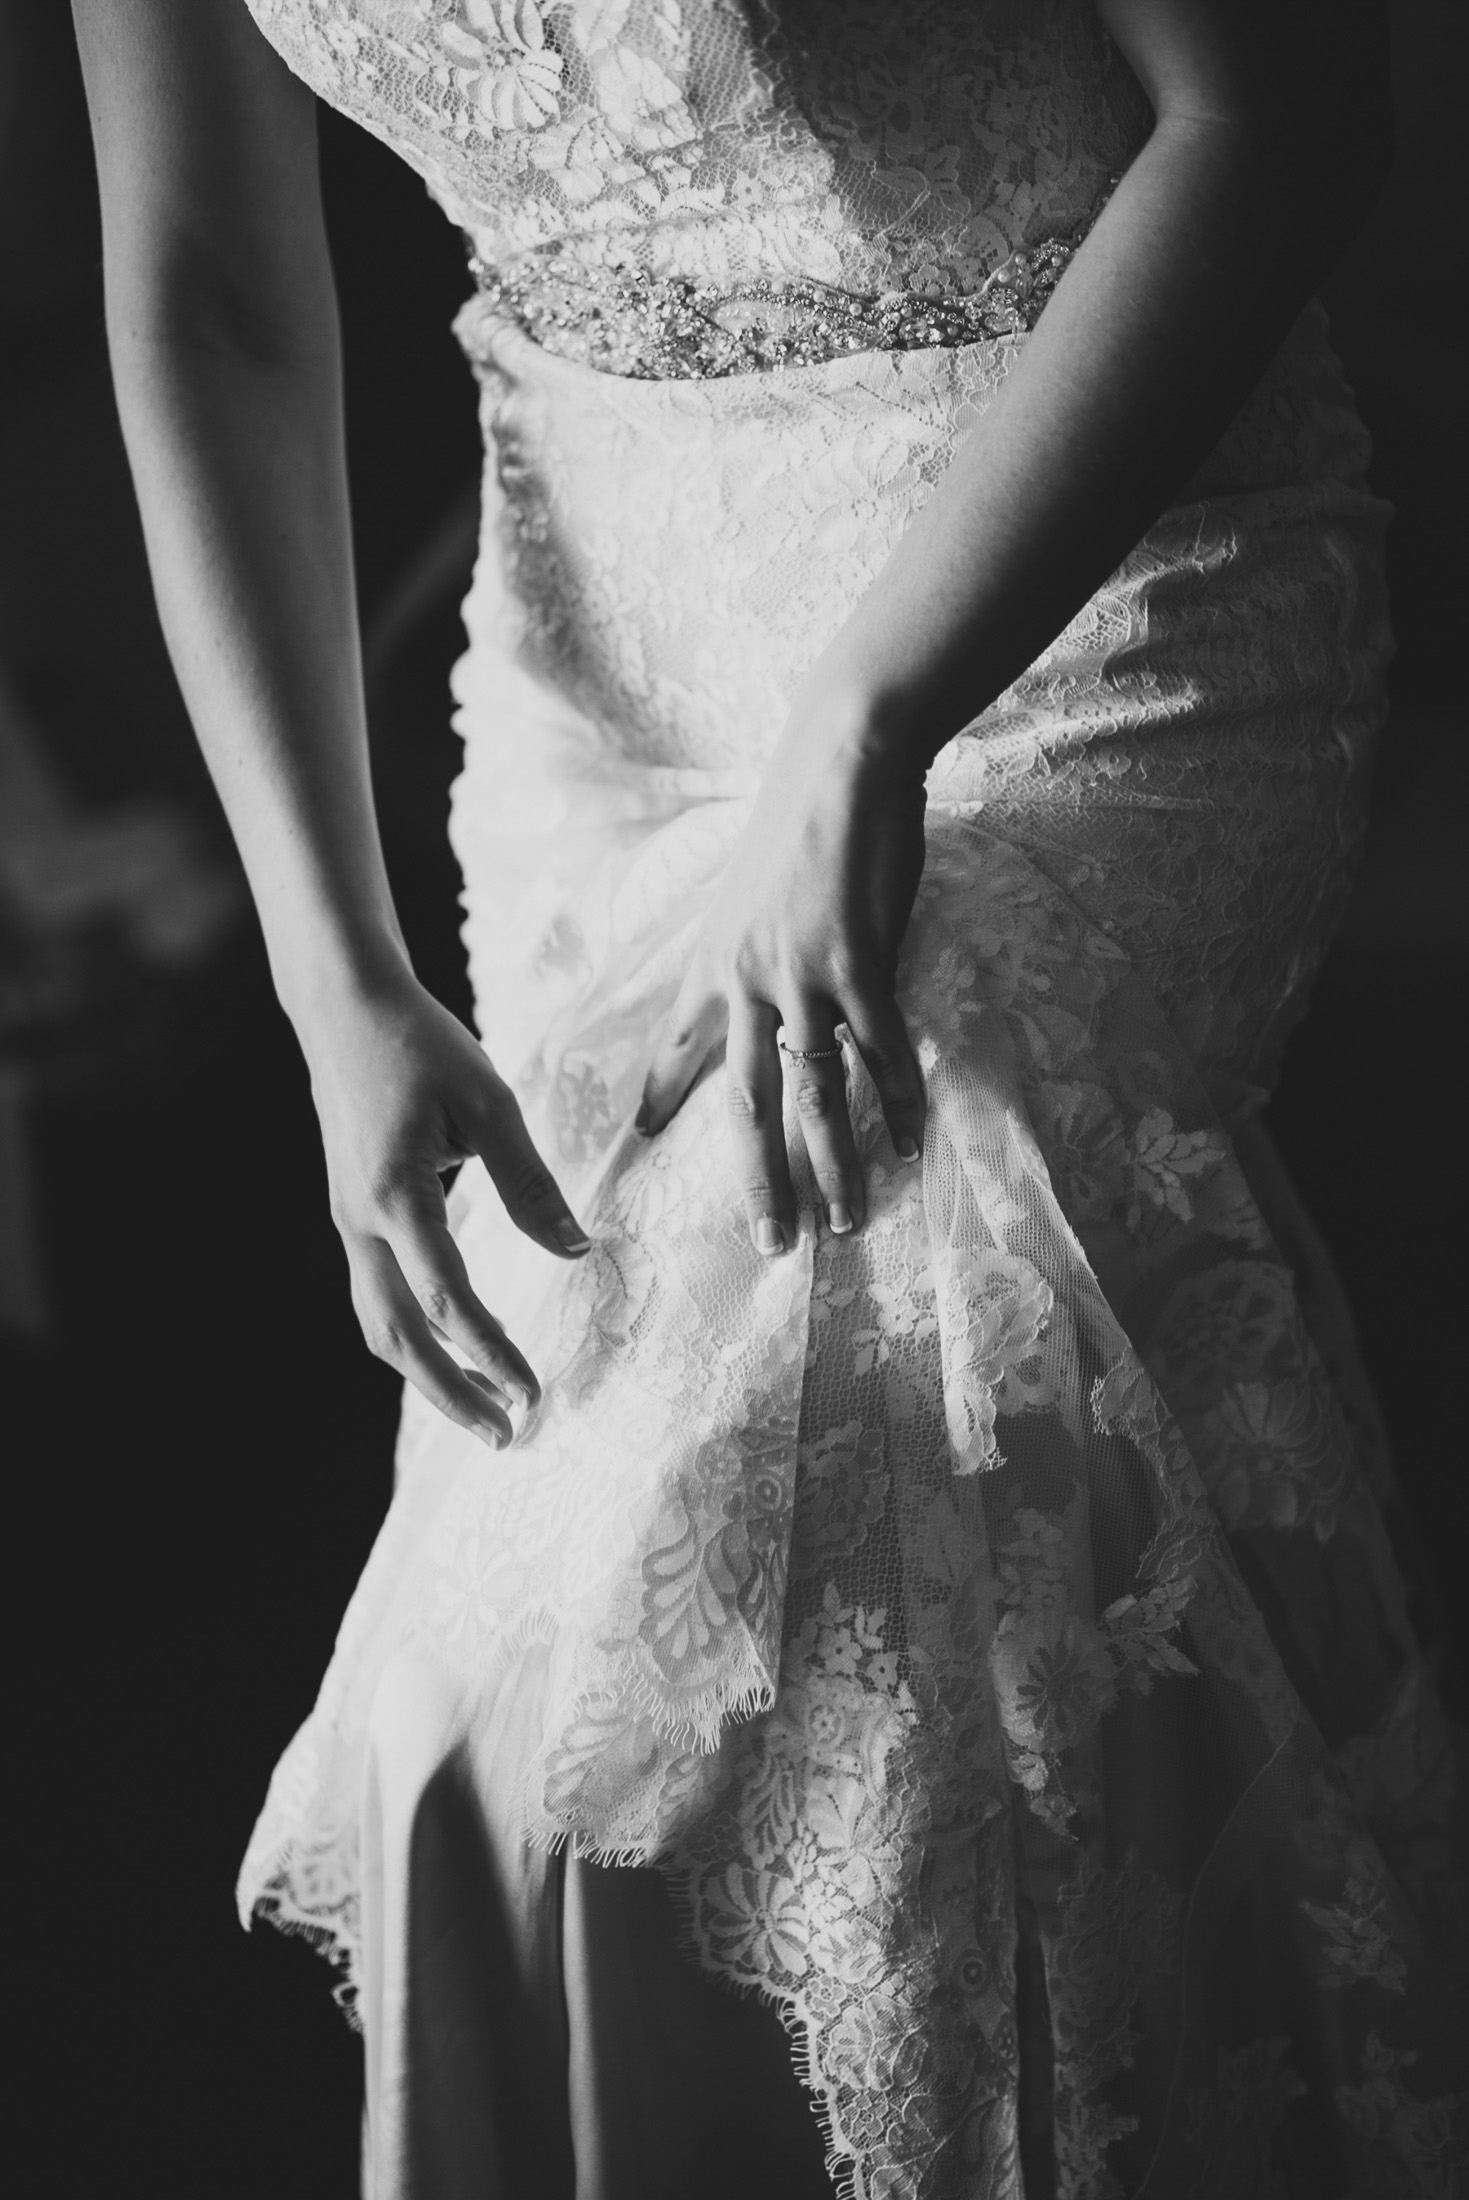 24elopement-photographer-colorado-026snow_mountain_ranch_wedding_colorado_wedding_photographer_kara&jason_0148_vintage_black_and_white_film.jpg